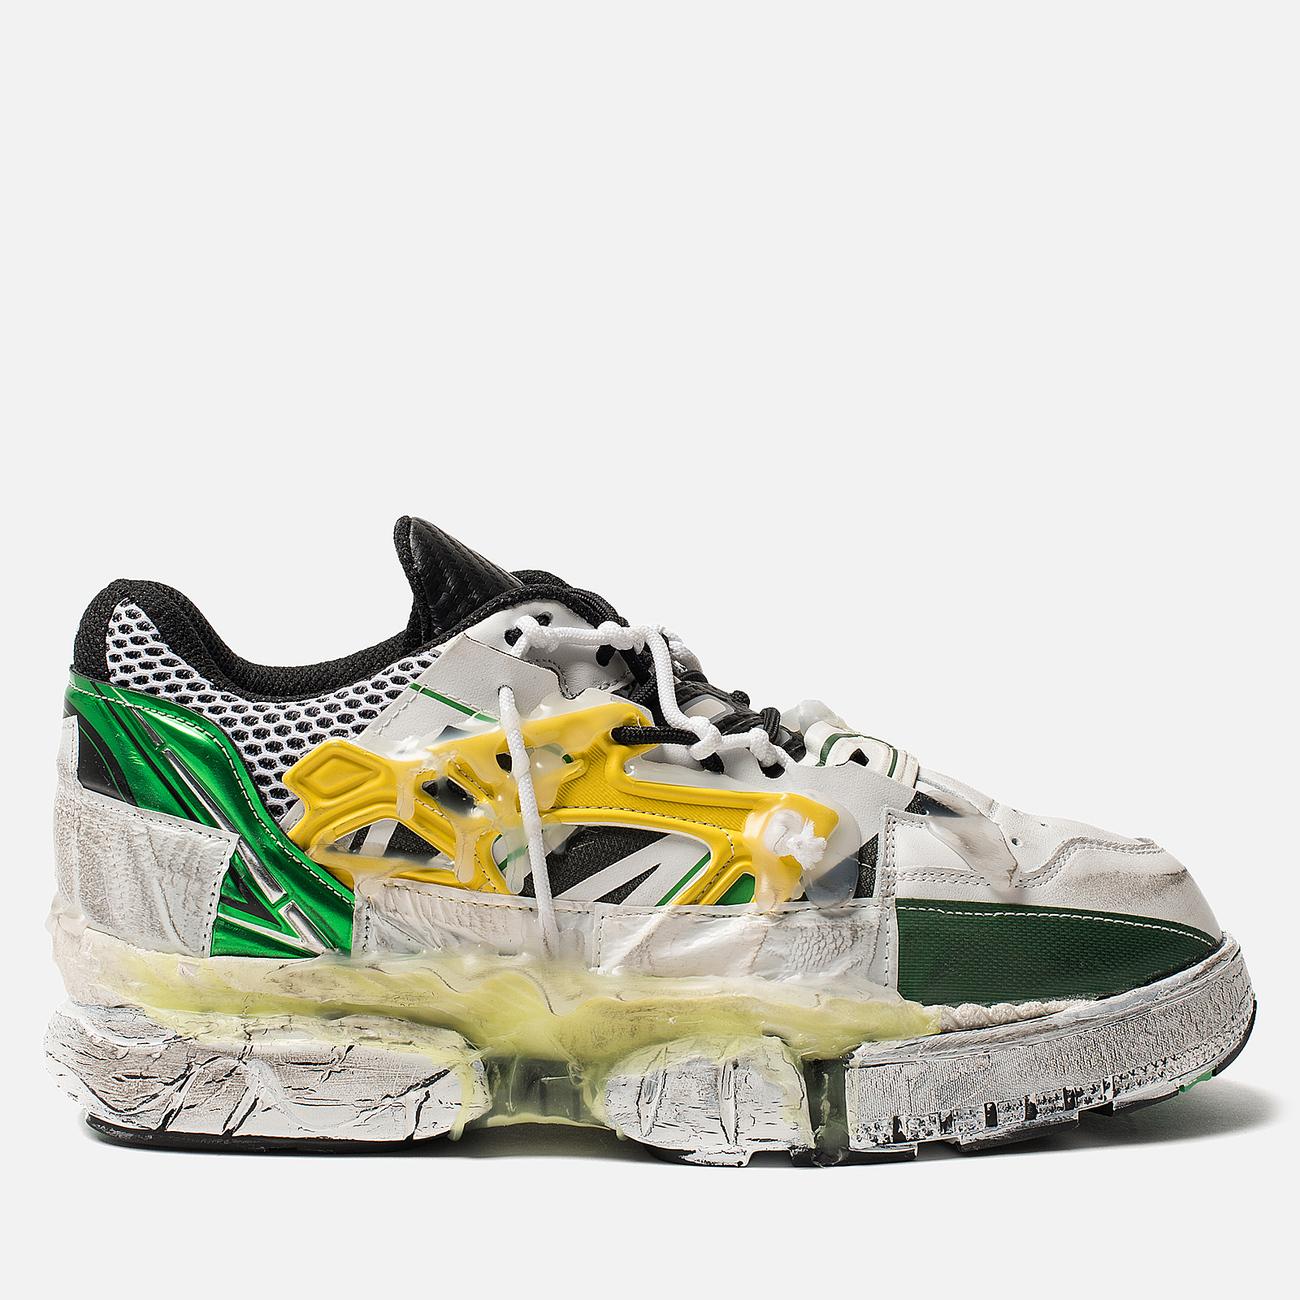 Мужские кроссовки Maison Margiela Fusion Low Top Yellow/Green